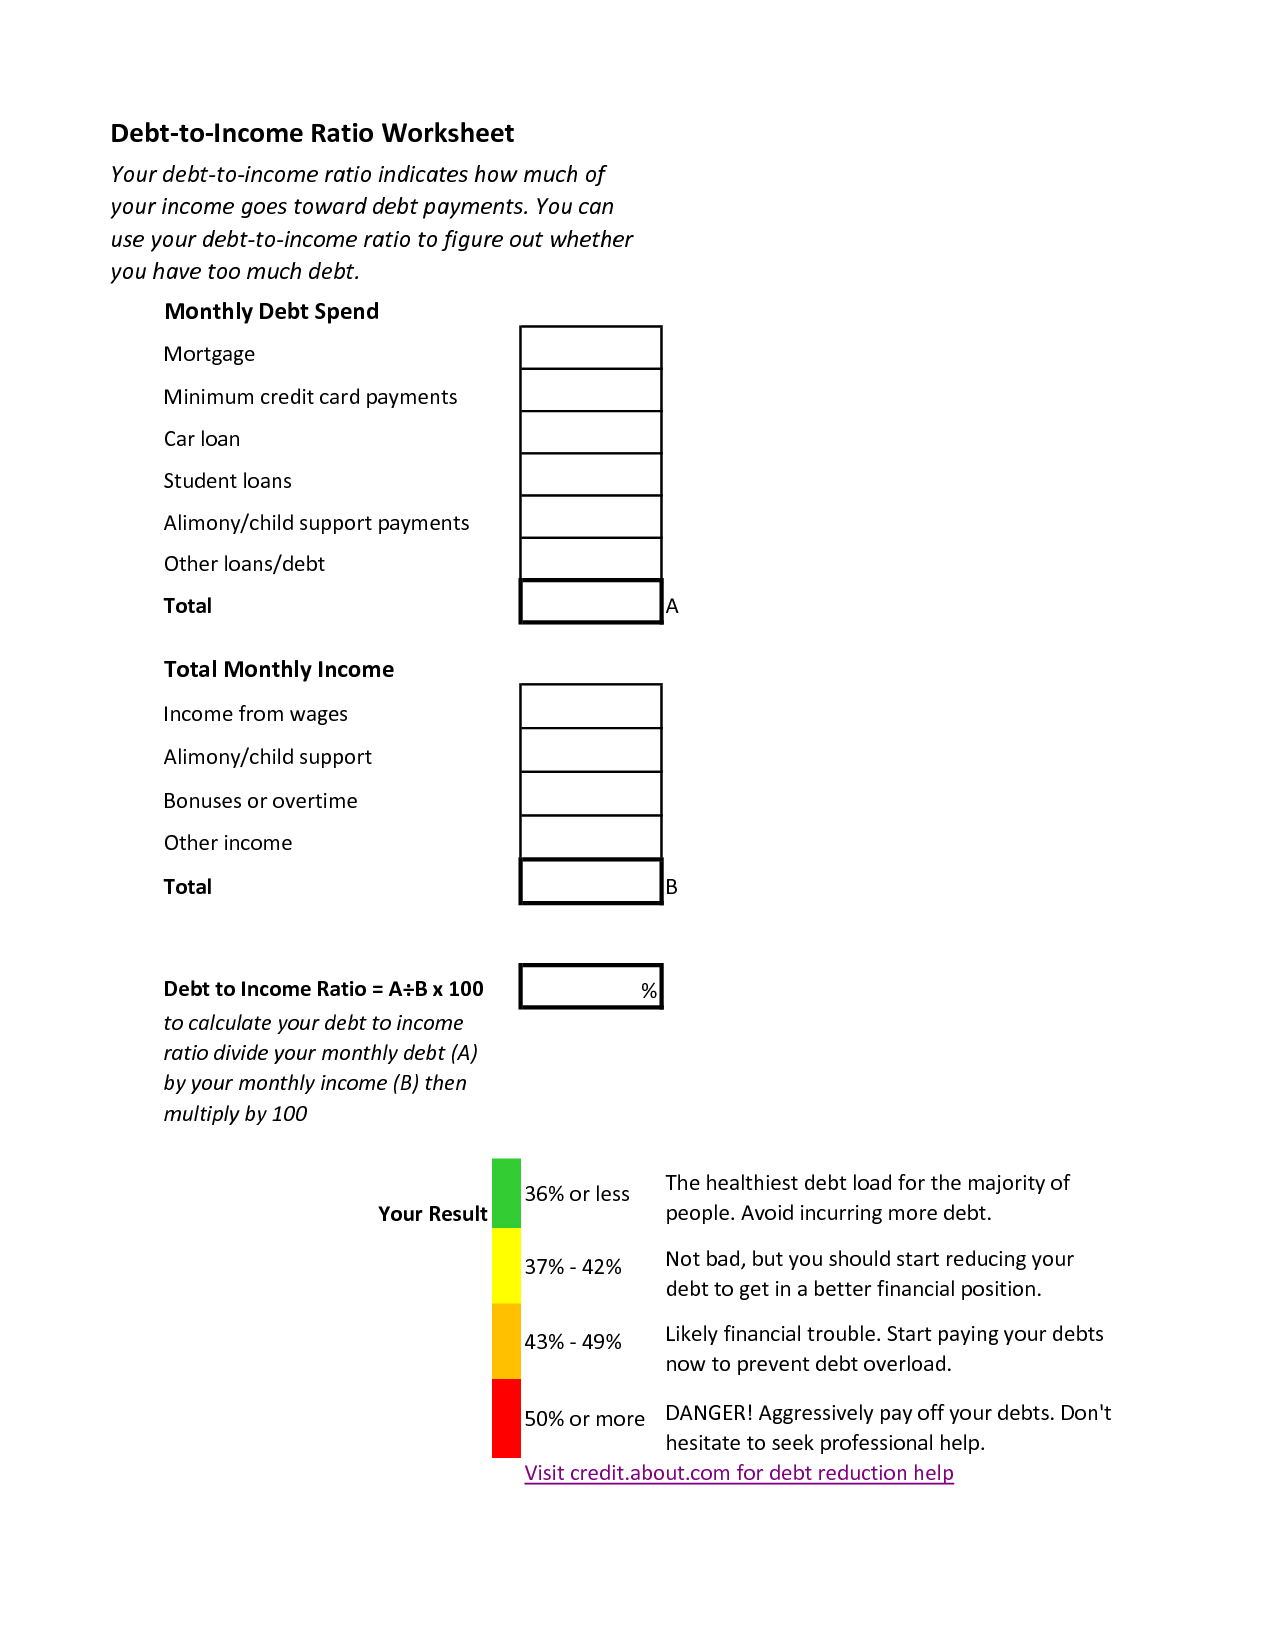 Blank Insolvency Worksheet